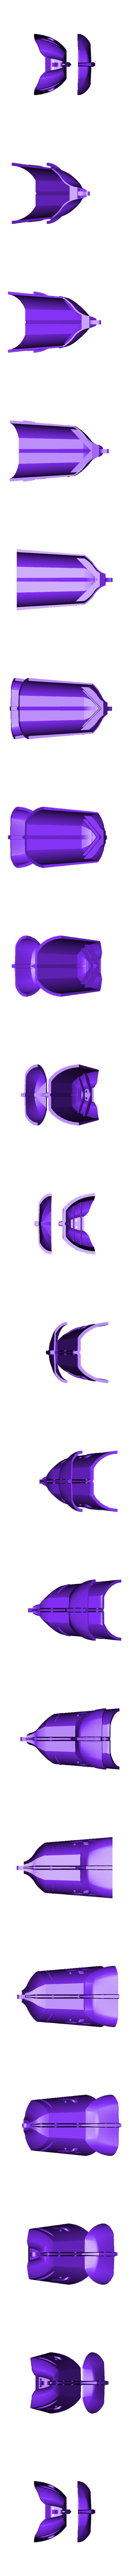 Lampshade_V3_Split.stl Download free STL file Airbus Inspired Aviation Lamp - Remix • 3D printing design, FreeBug